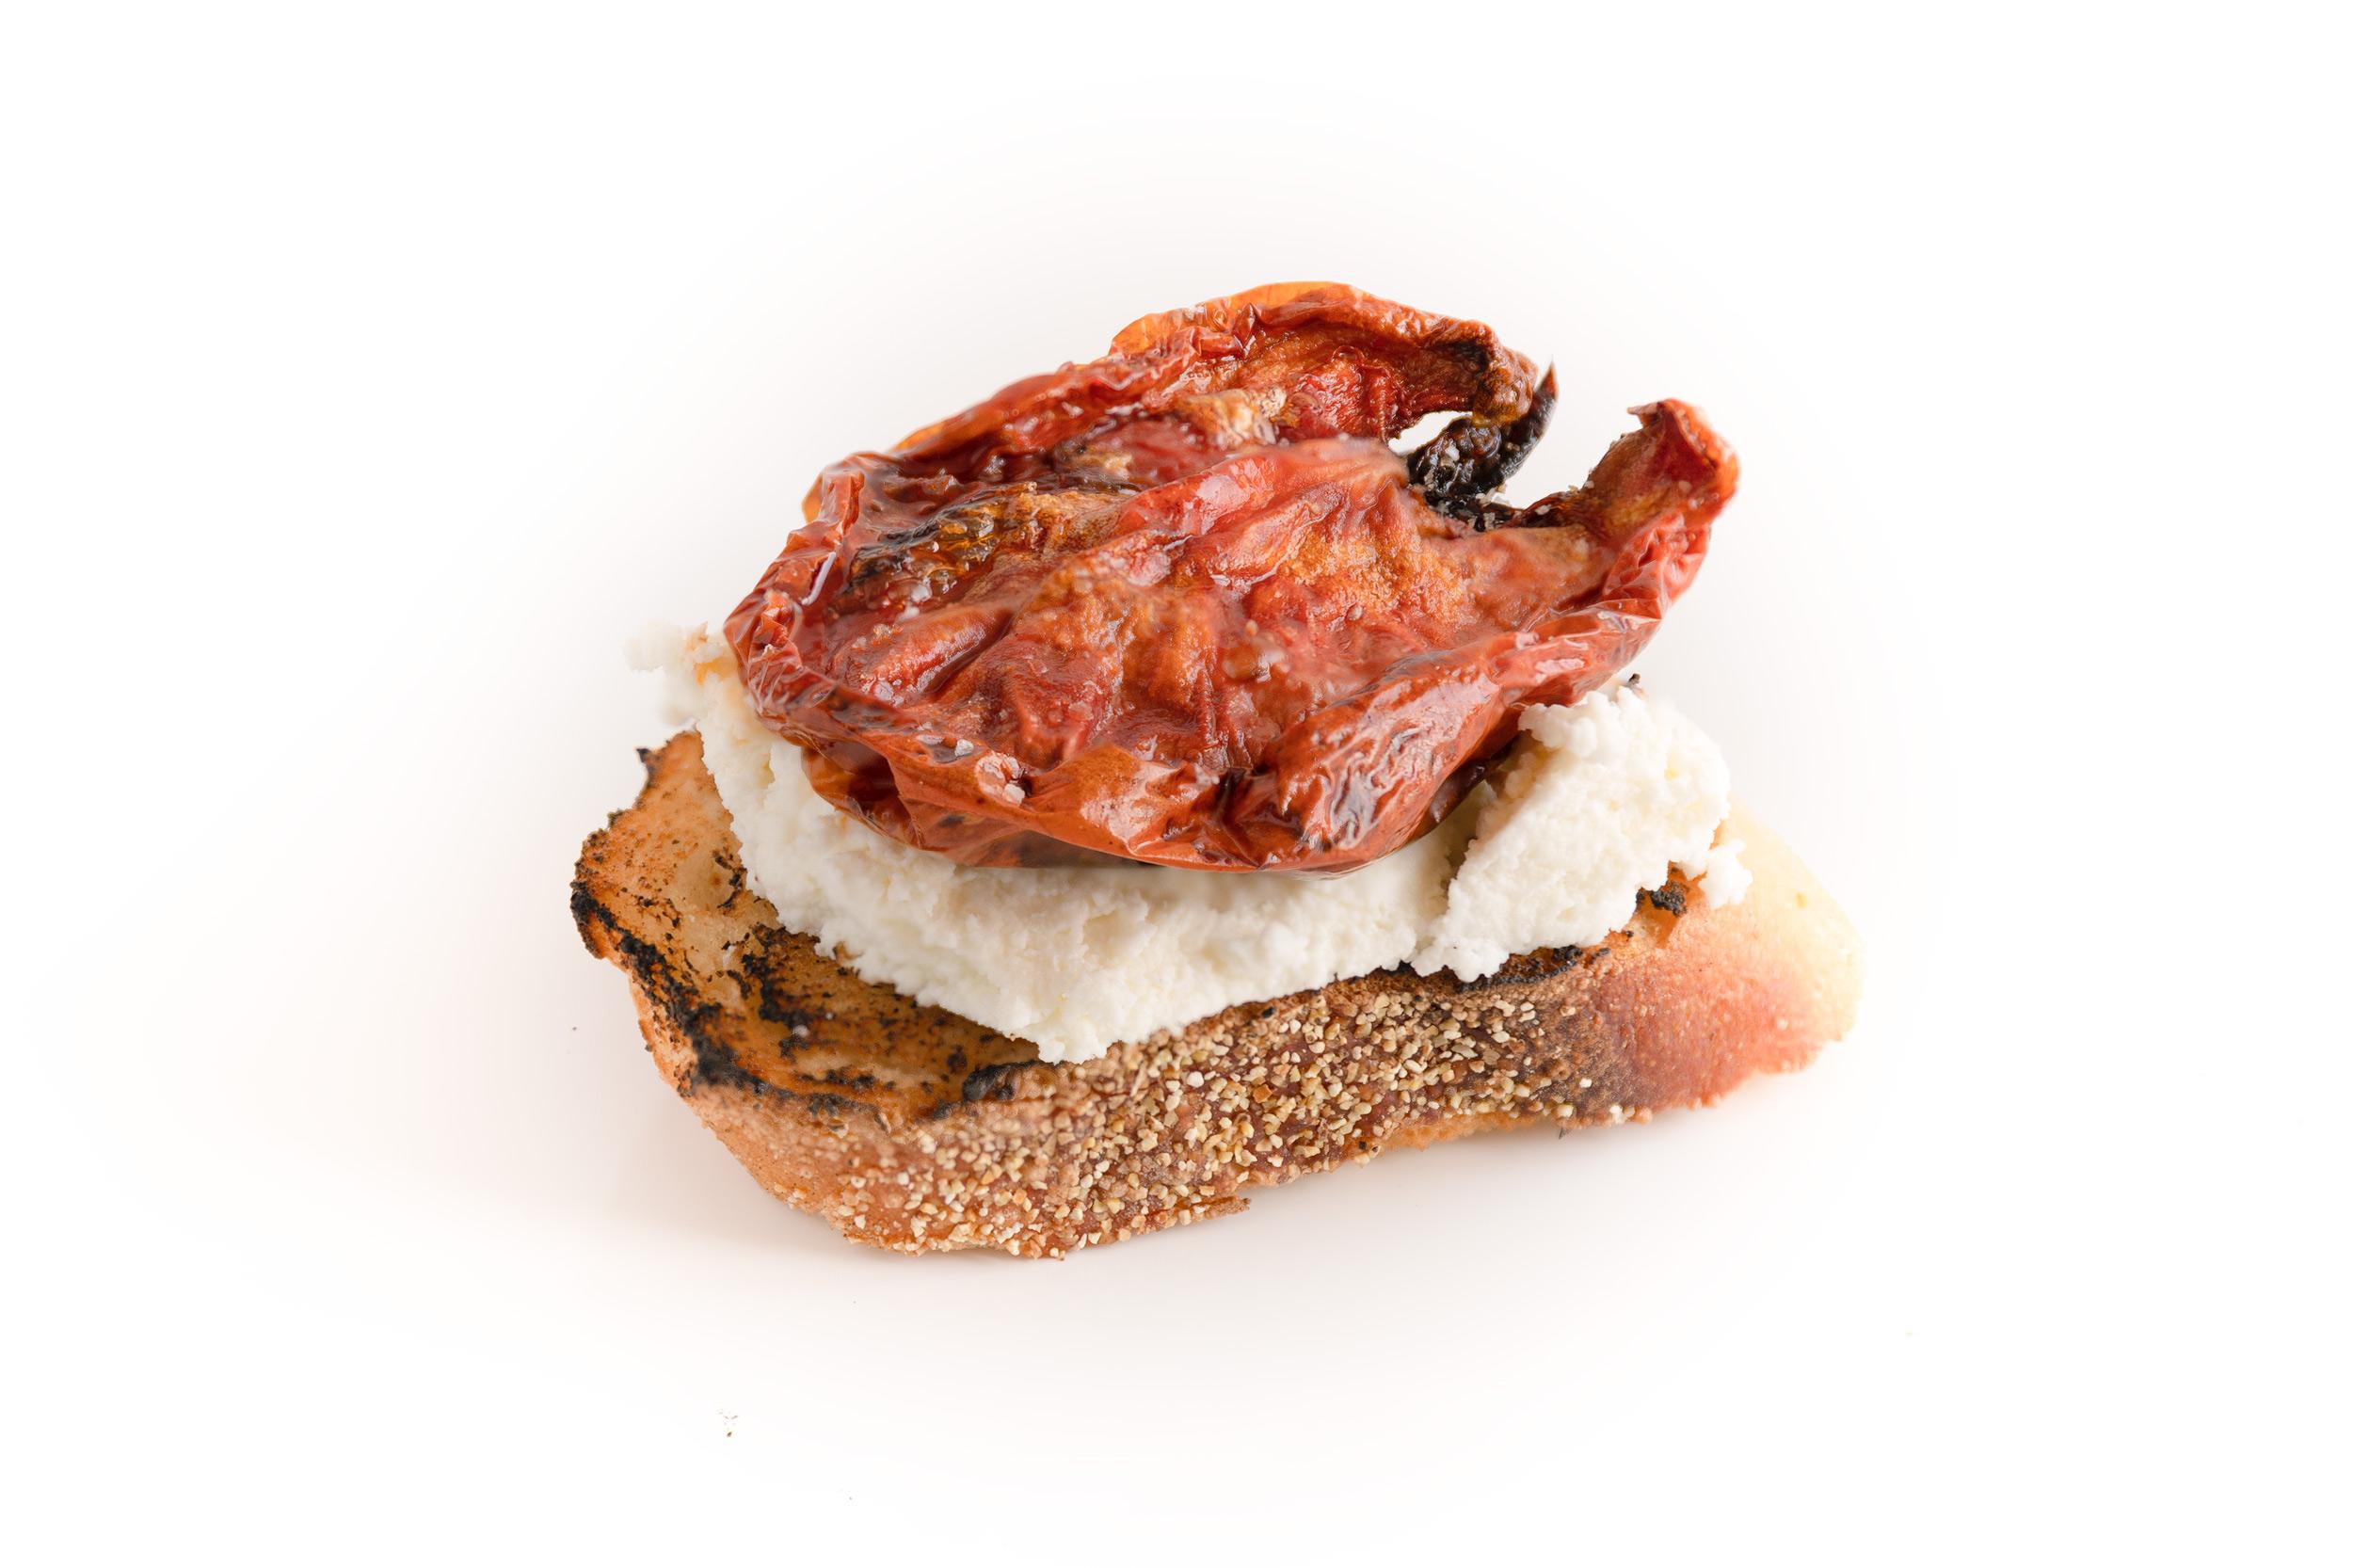 Anthony-LeDonne-Loves-Things-On-Toasts.jpg